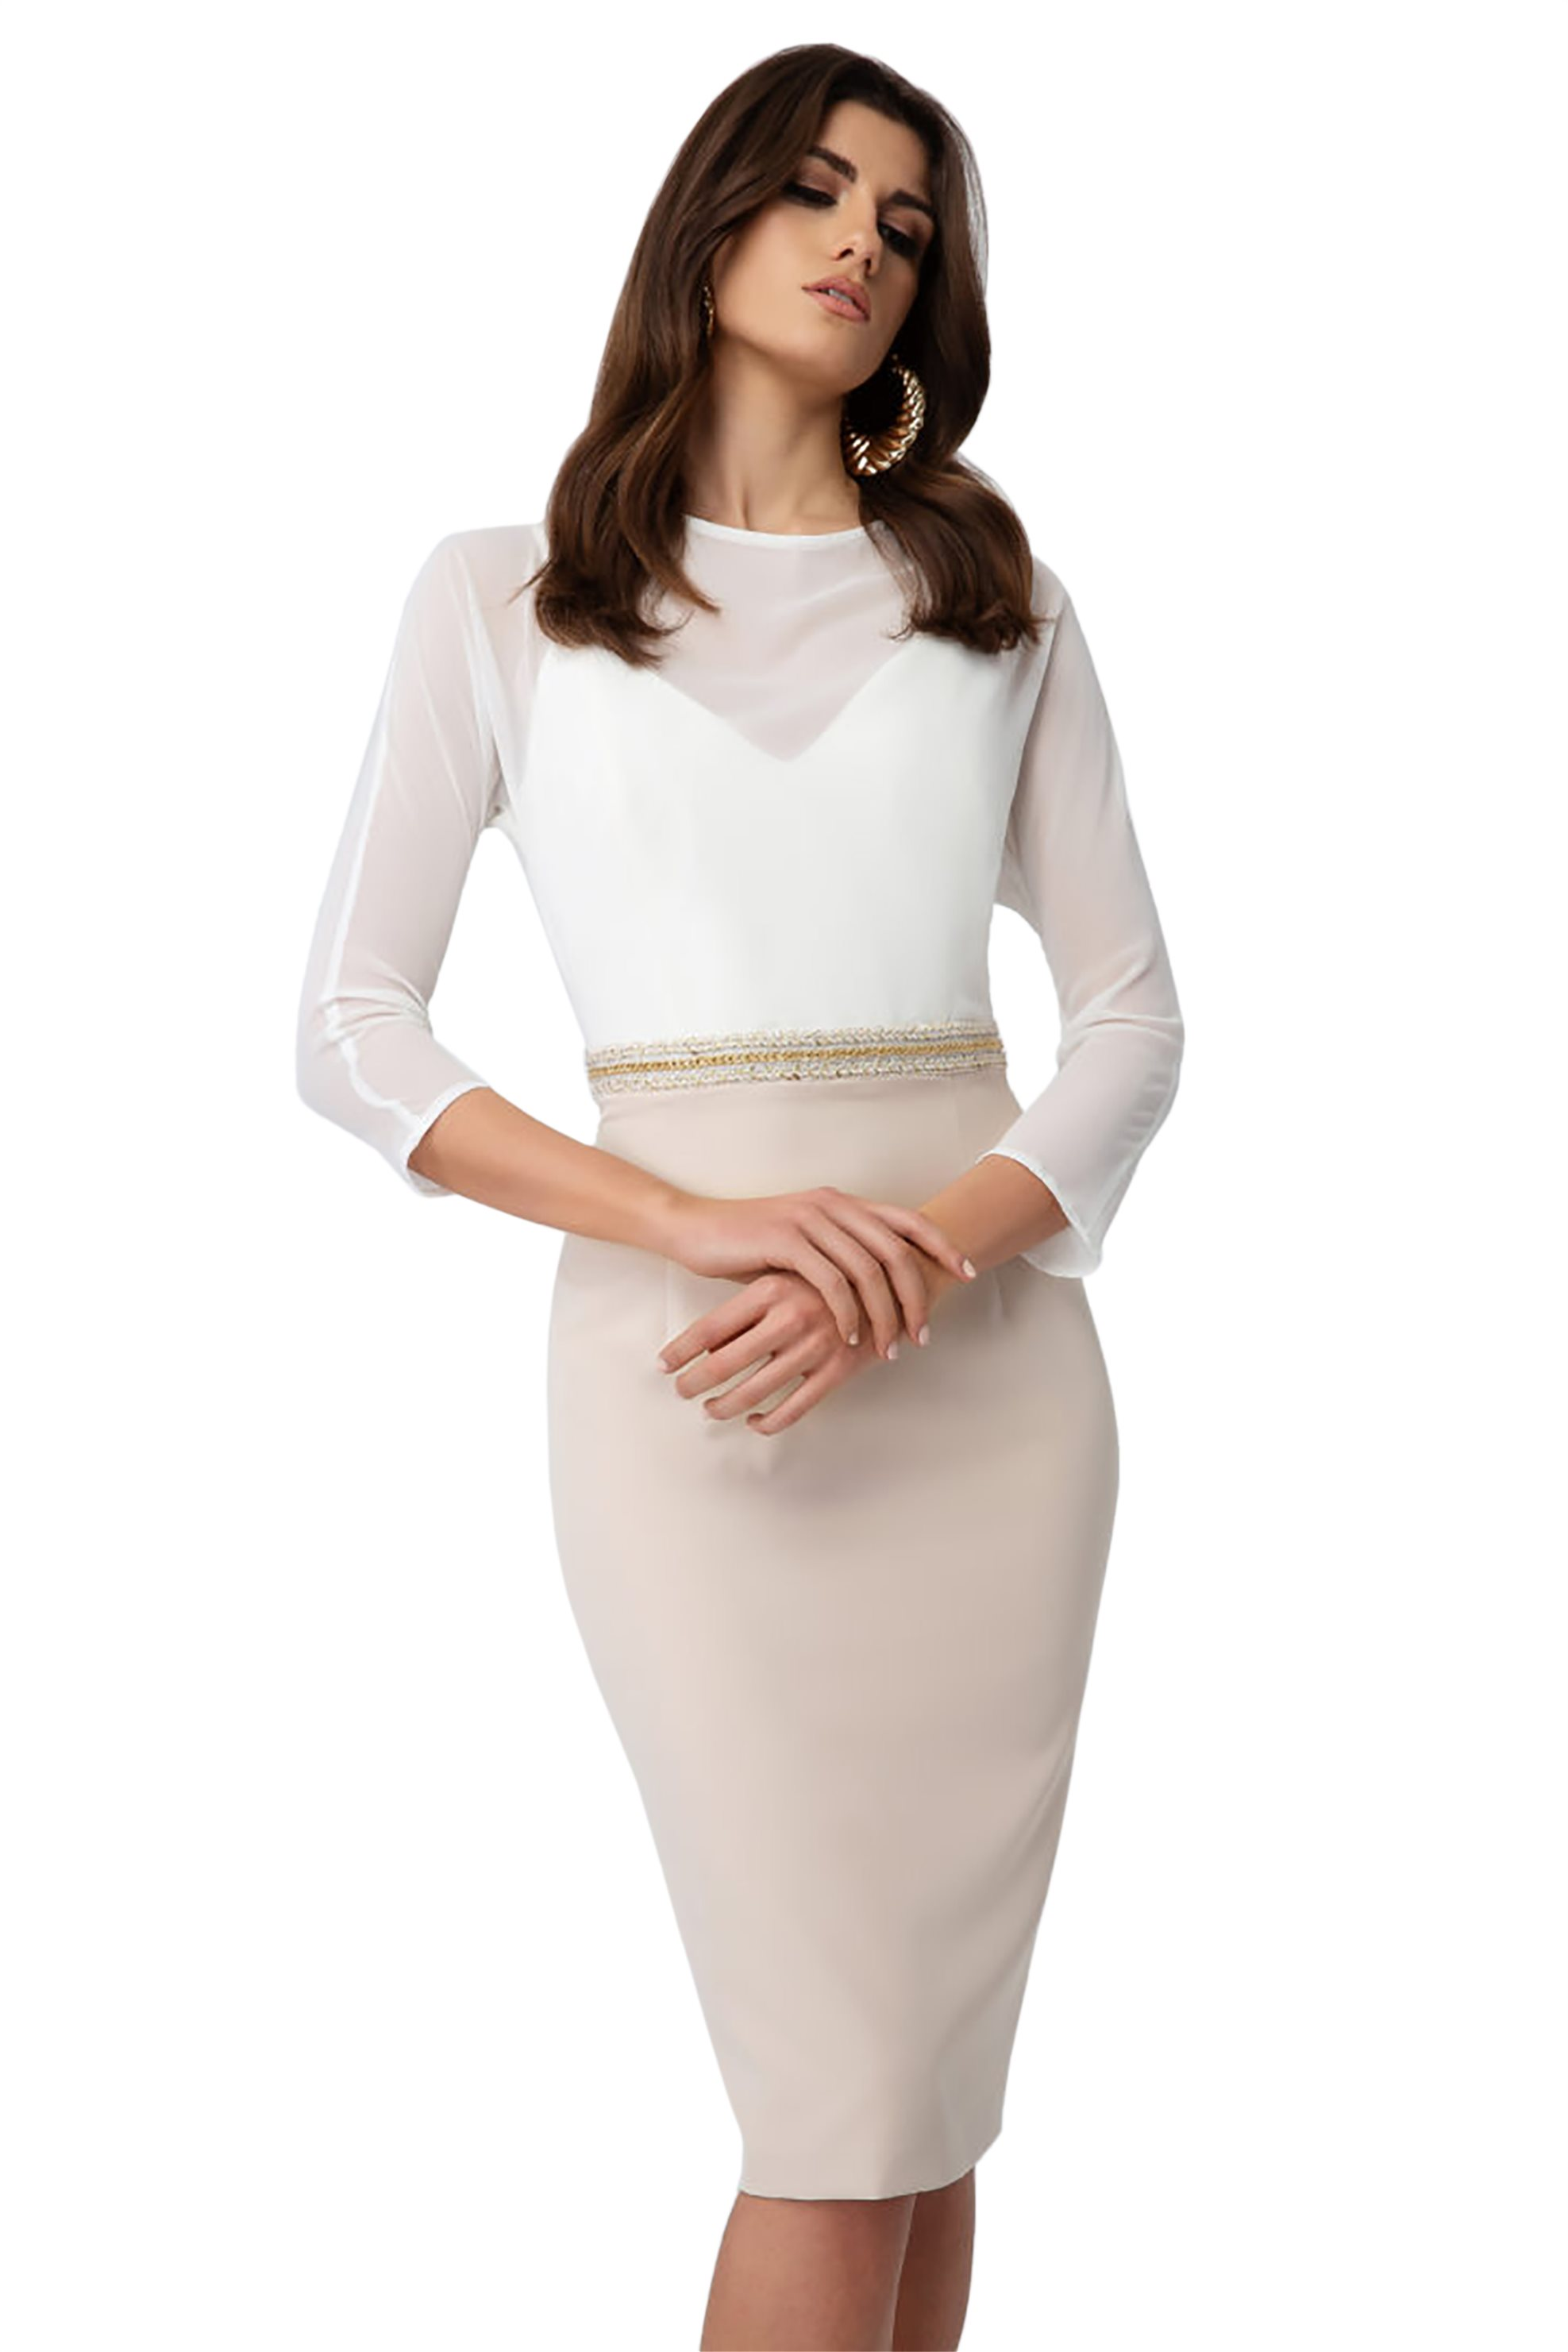 Billy Sabbado γυναικείο φόρεμα pencil με λεπτομέρεια στην μέση - 0210903154 - Μπ γυναικα   ρουχα   φορέματα   midi φορέματα